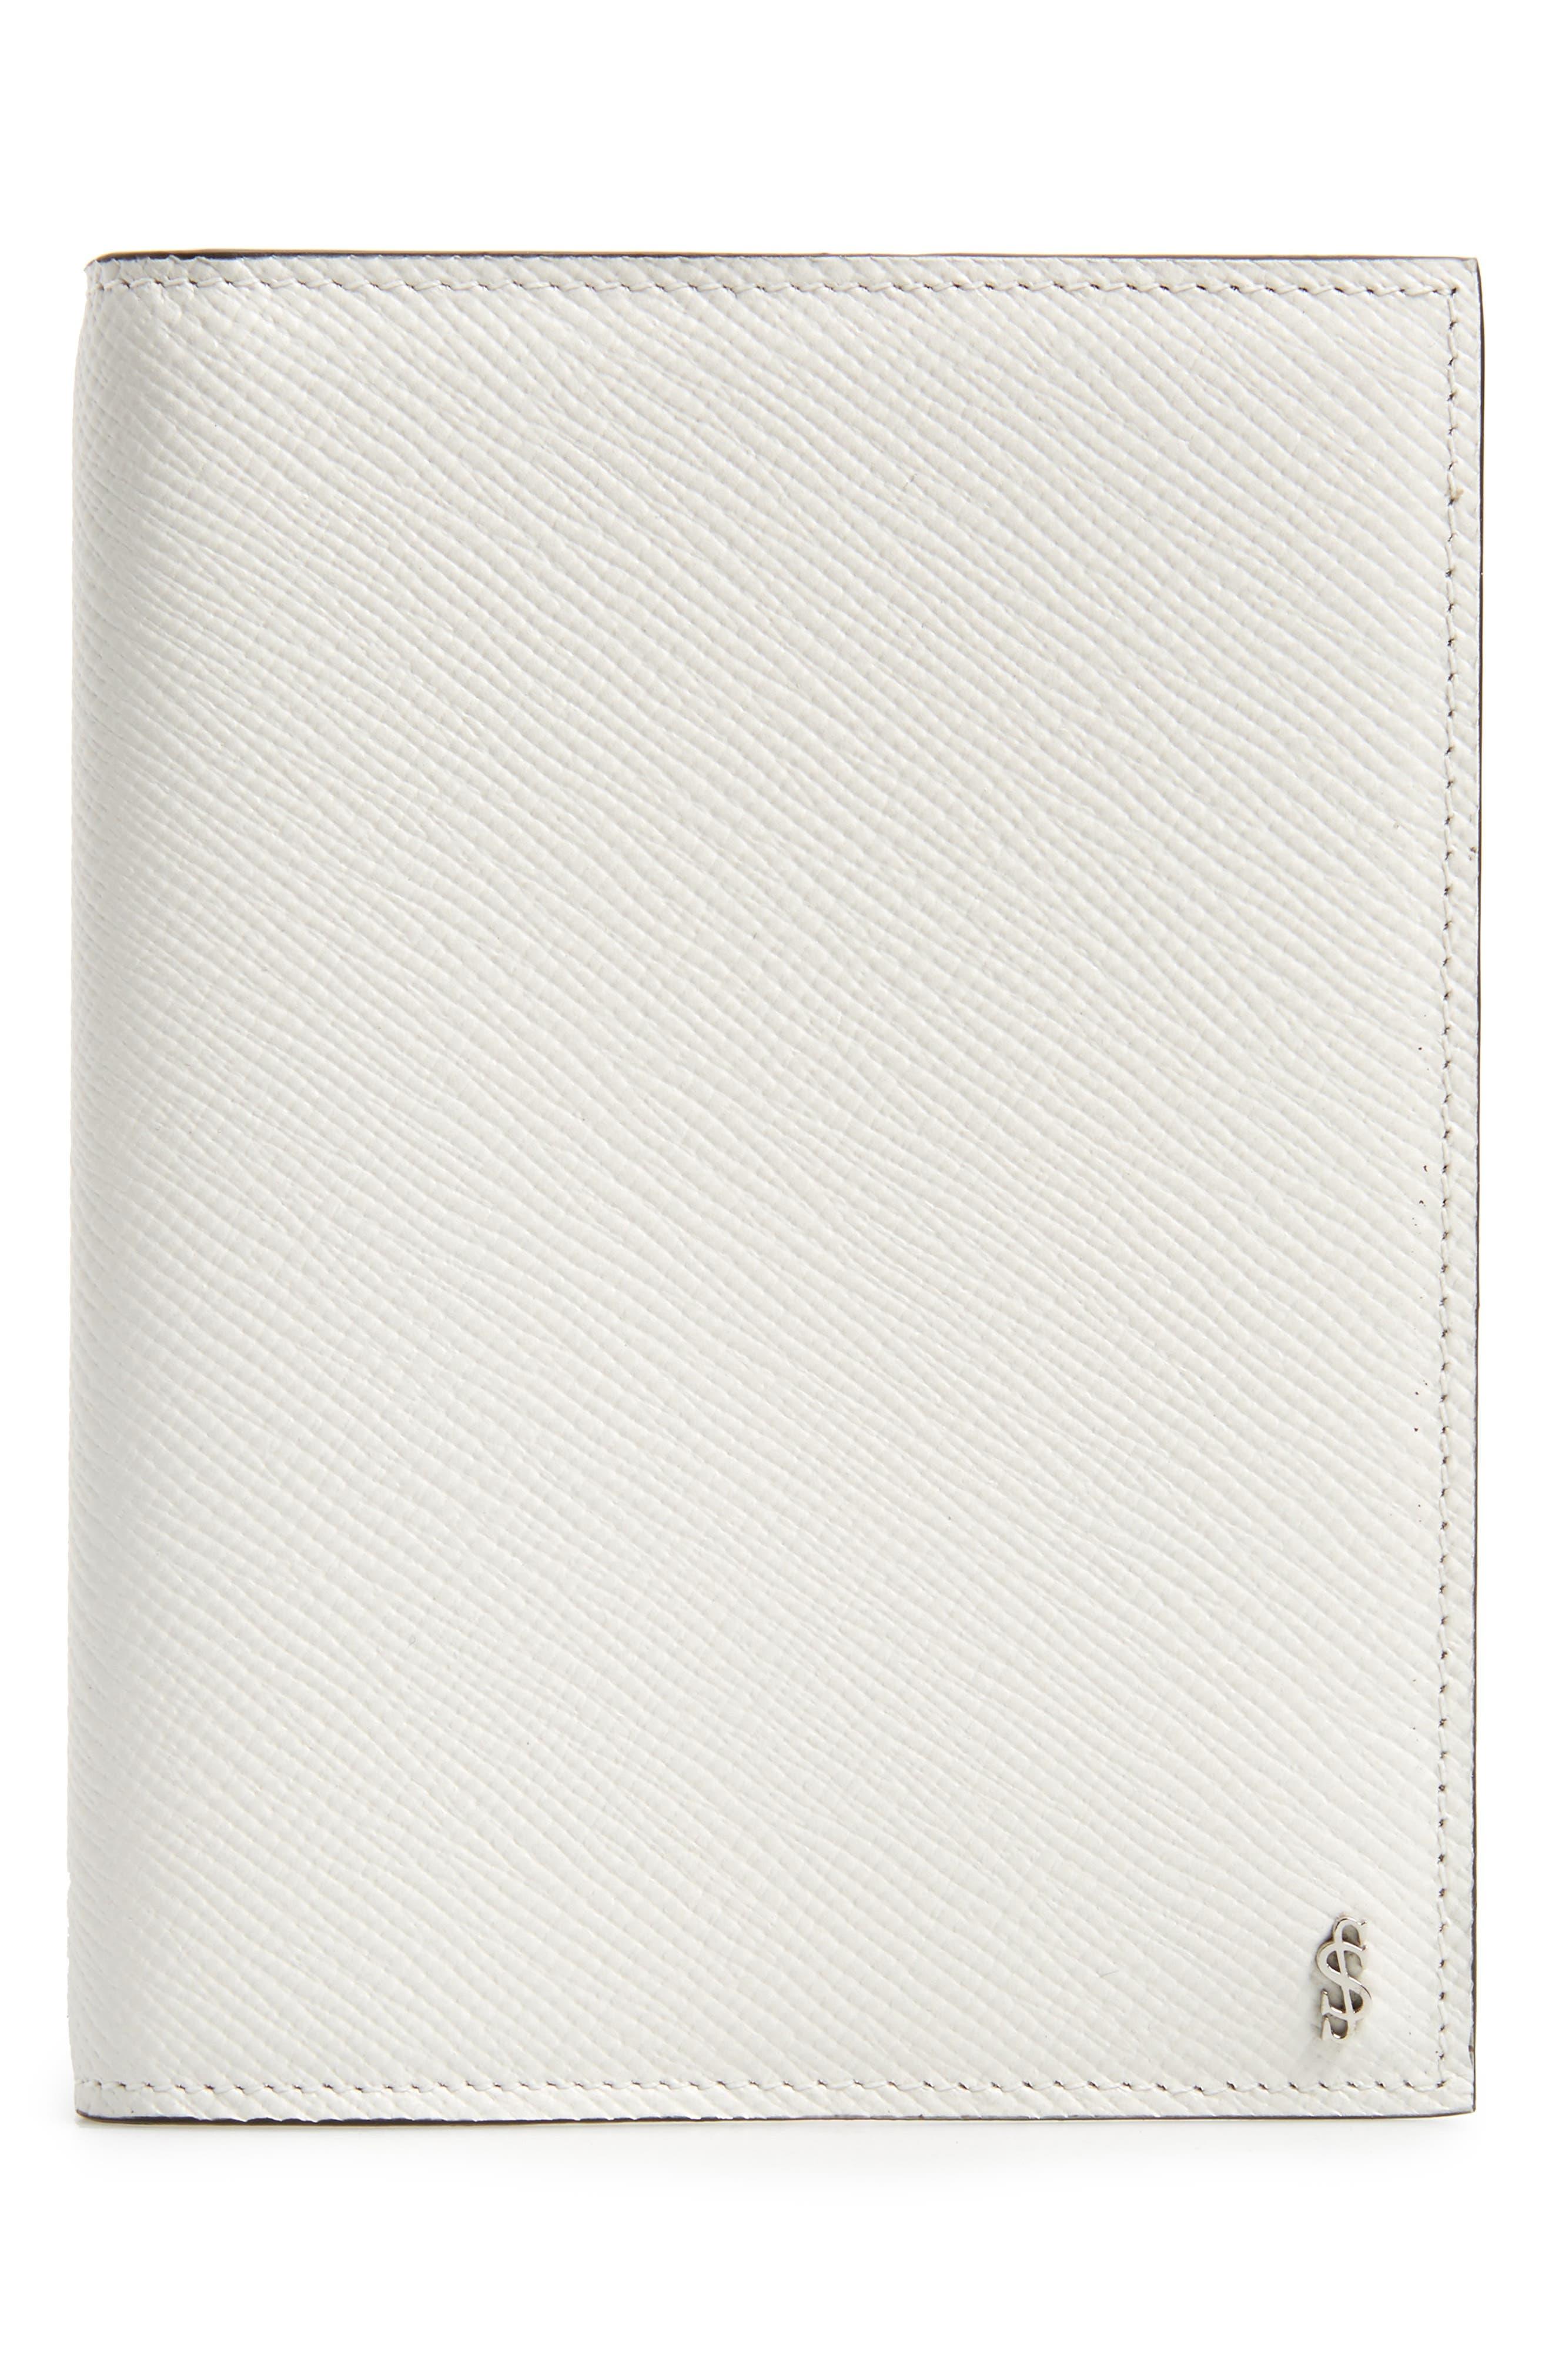 Main Image - Serapian Milano Evolution Leather Passport Case